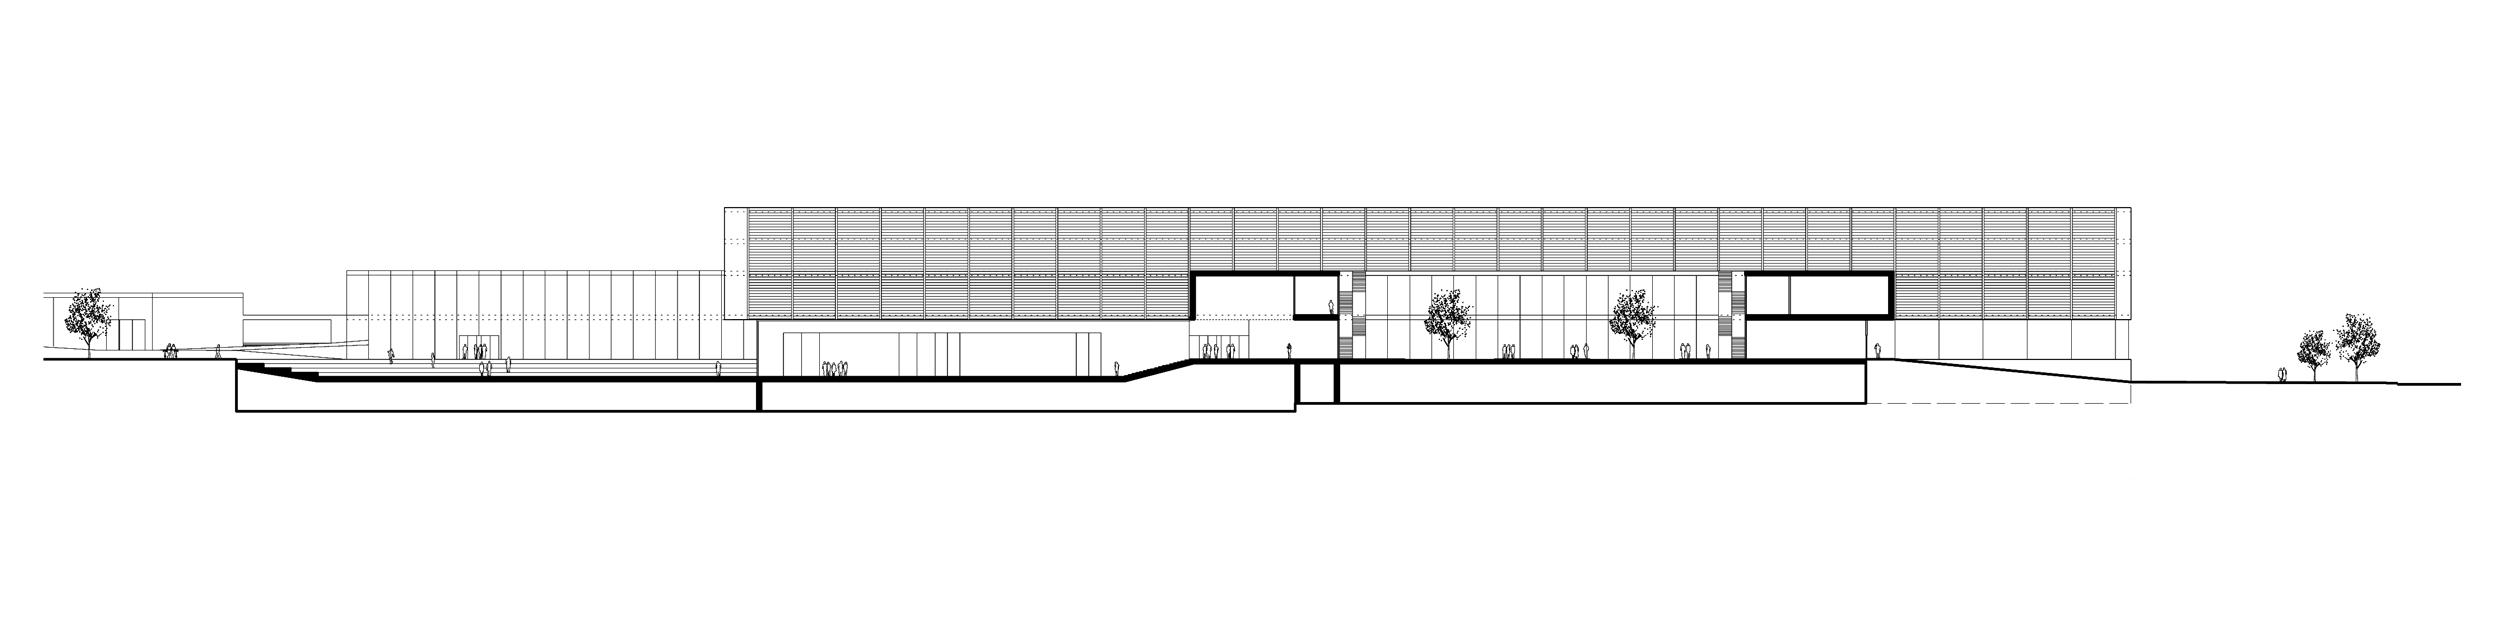 Aalto-section-CW7.jpg